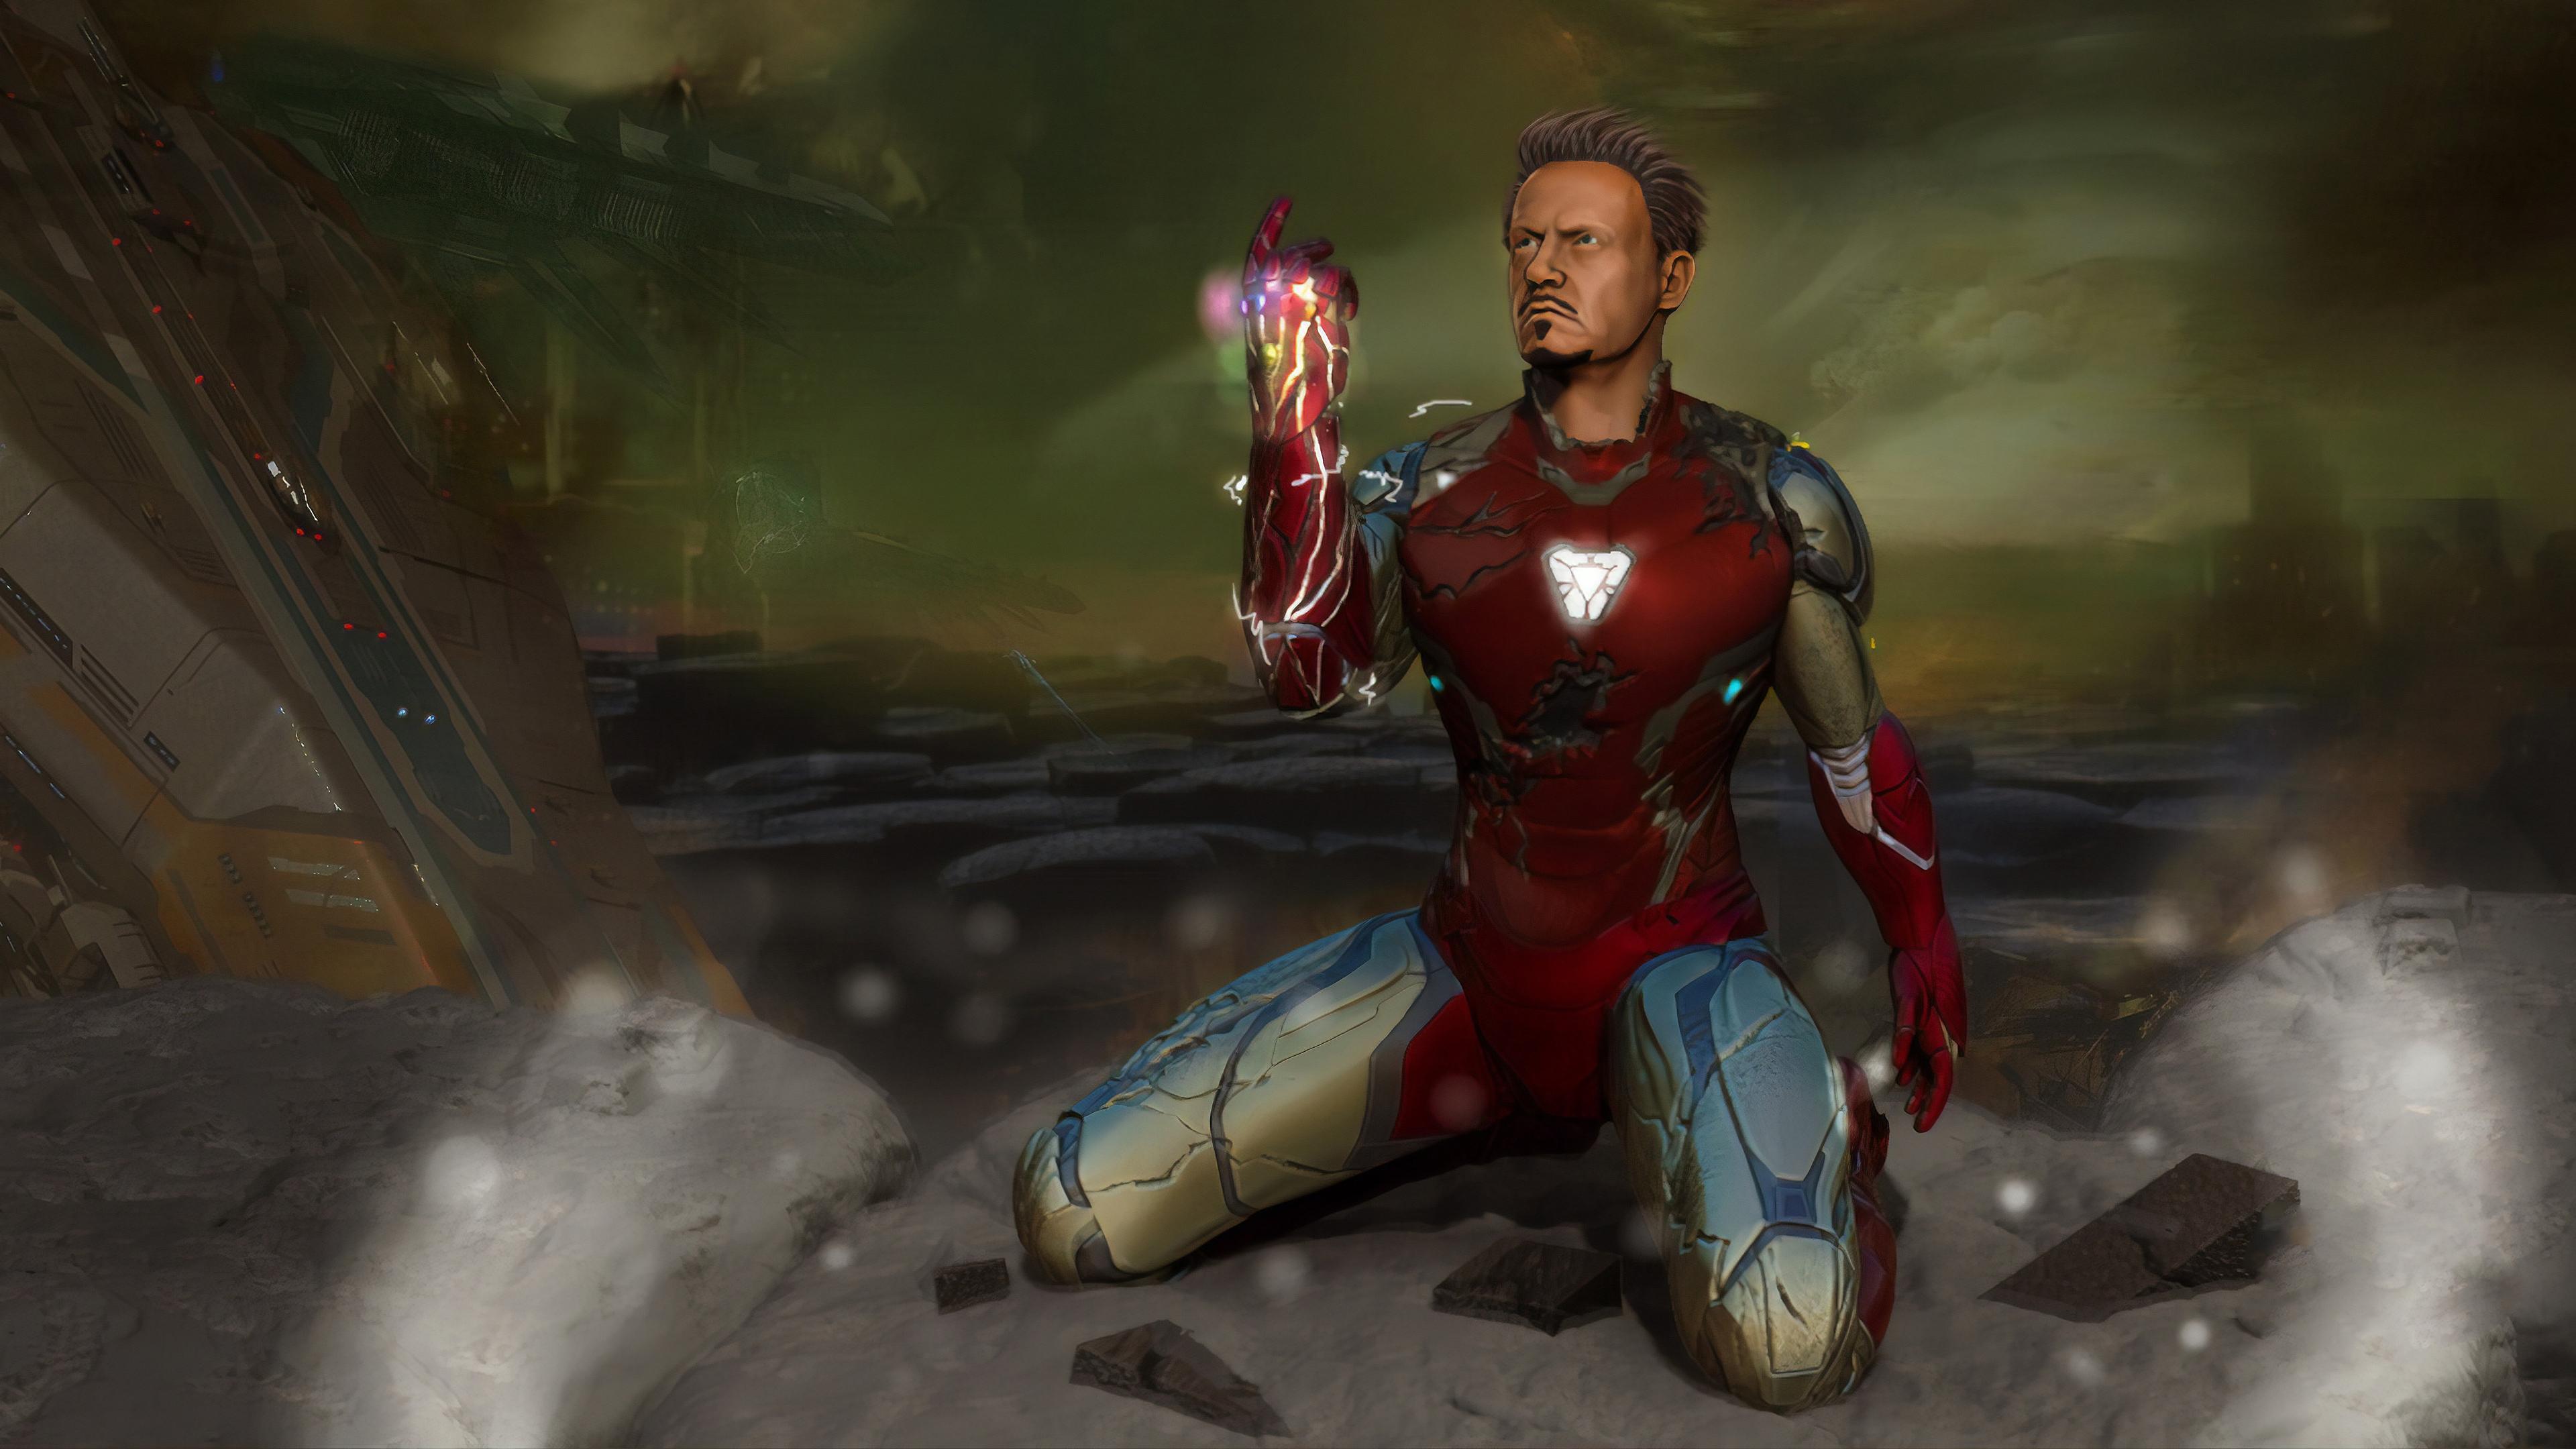 iron man avengers art 1560533641 - Iron Man Avengers Art - superheroes wallpapers, iron man wallpapers, hd-wallpapers, digital art wallpapers, behance wallpapers, artwork wallpapers, 4k-wallpapers